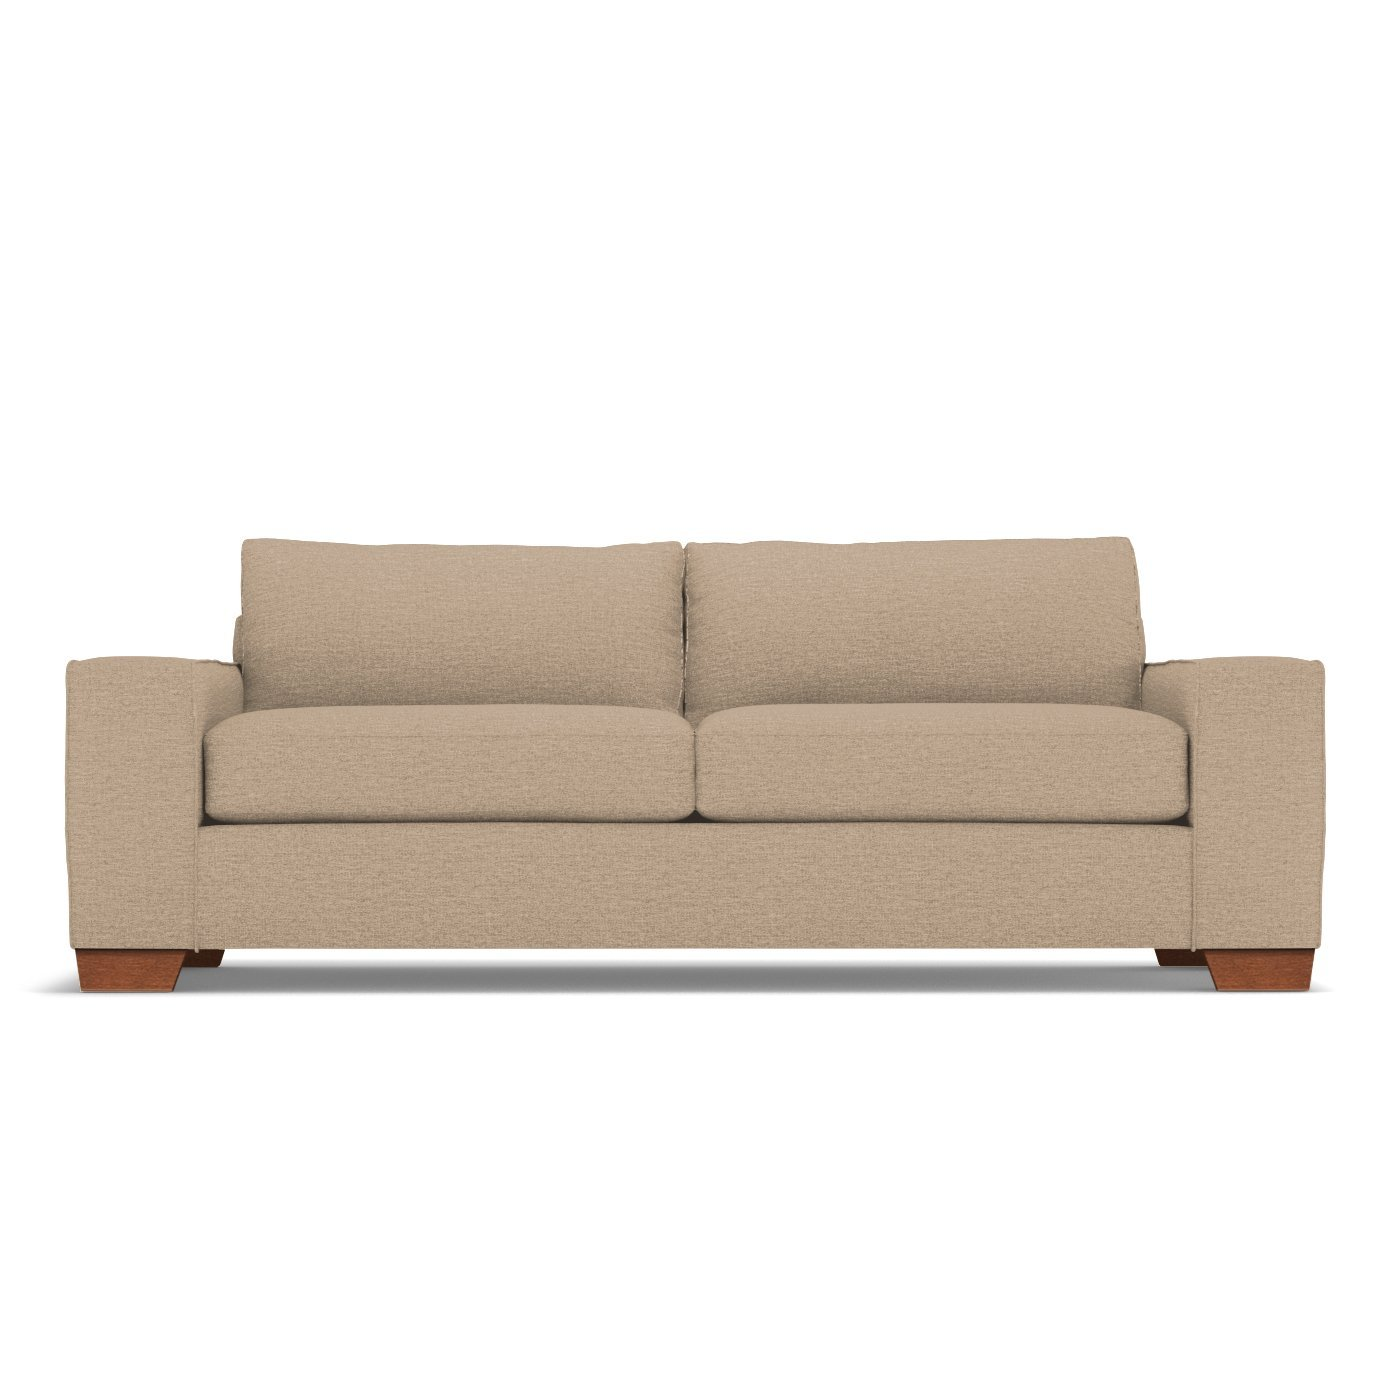 - APT2B Melrose Sleeper Sofa Queen Size CHOICE OF FABRICS & WOOD